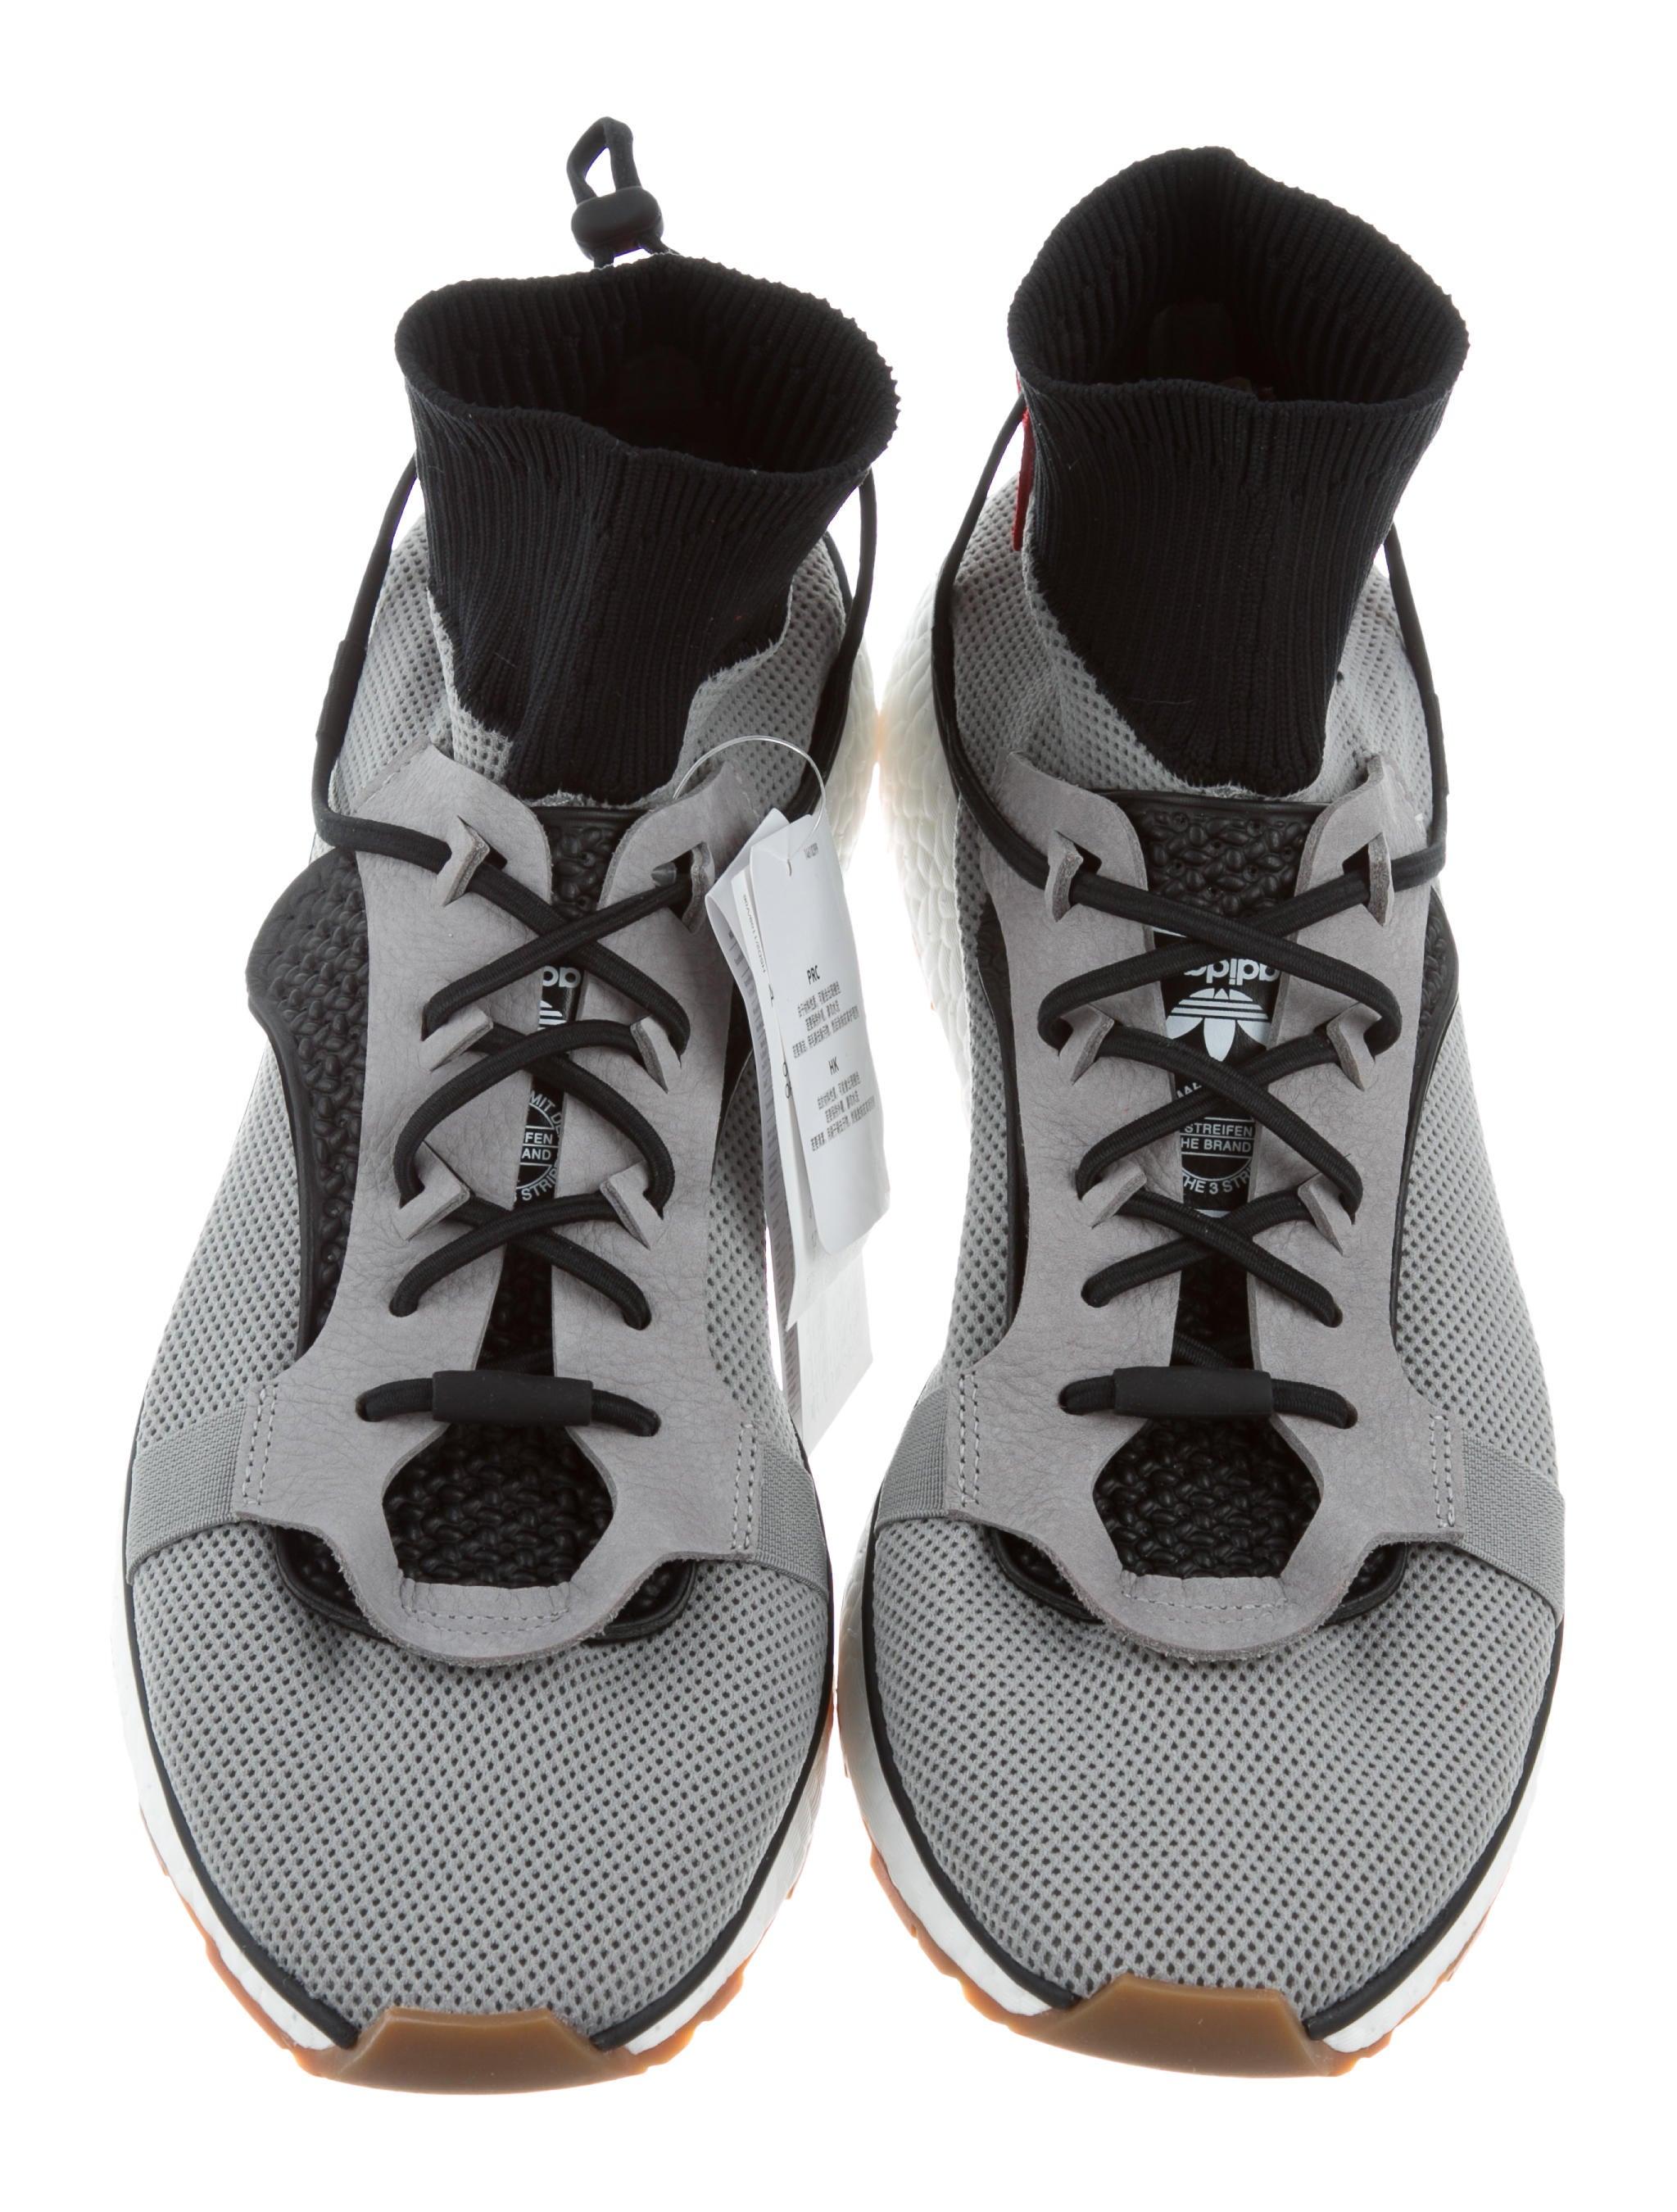 Alexander Wang X Adidas Aw Run Sock Sneakers W Tags